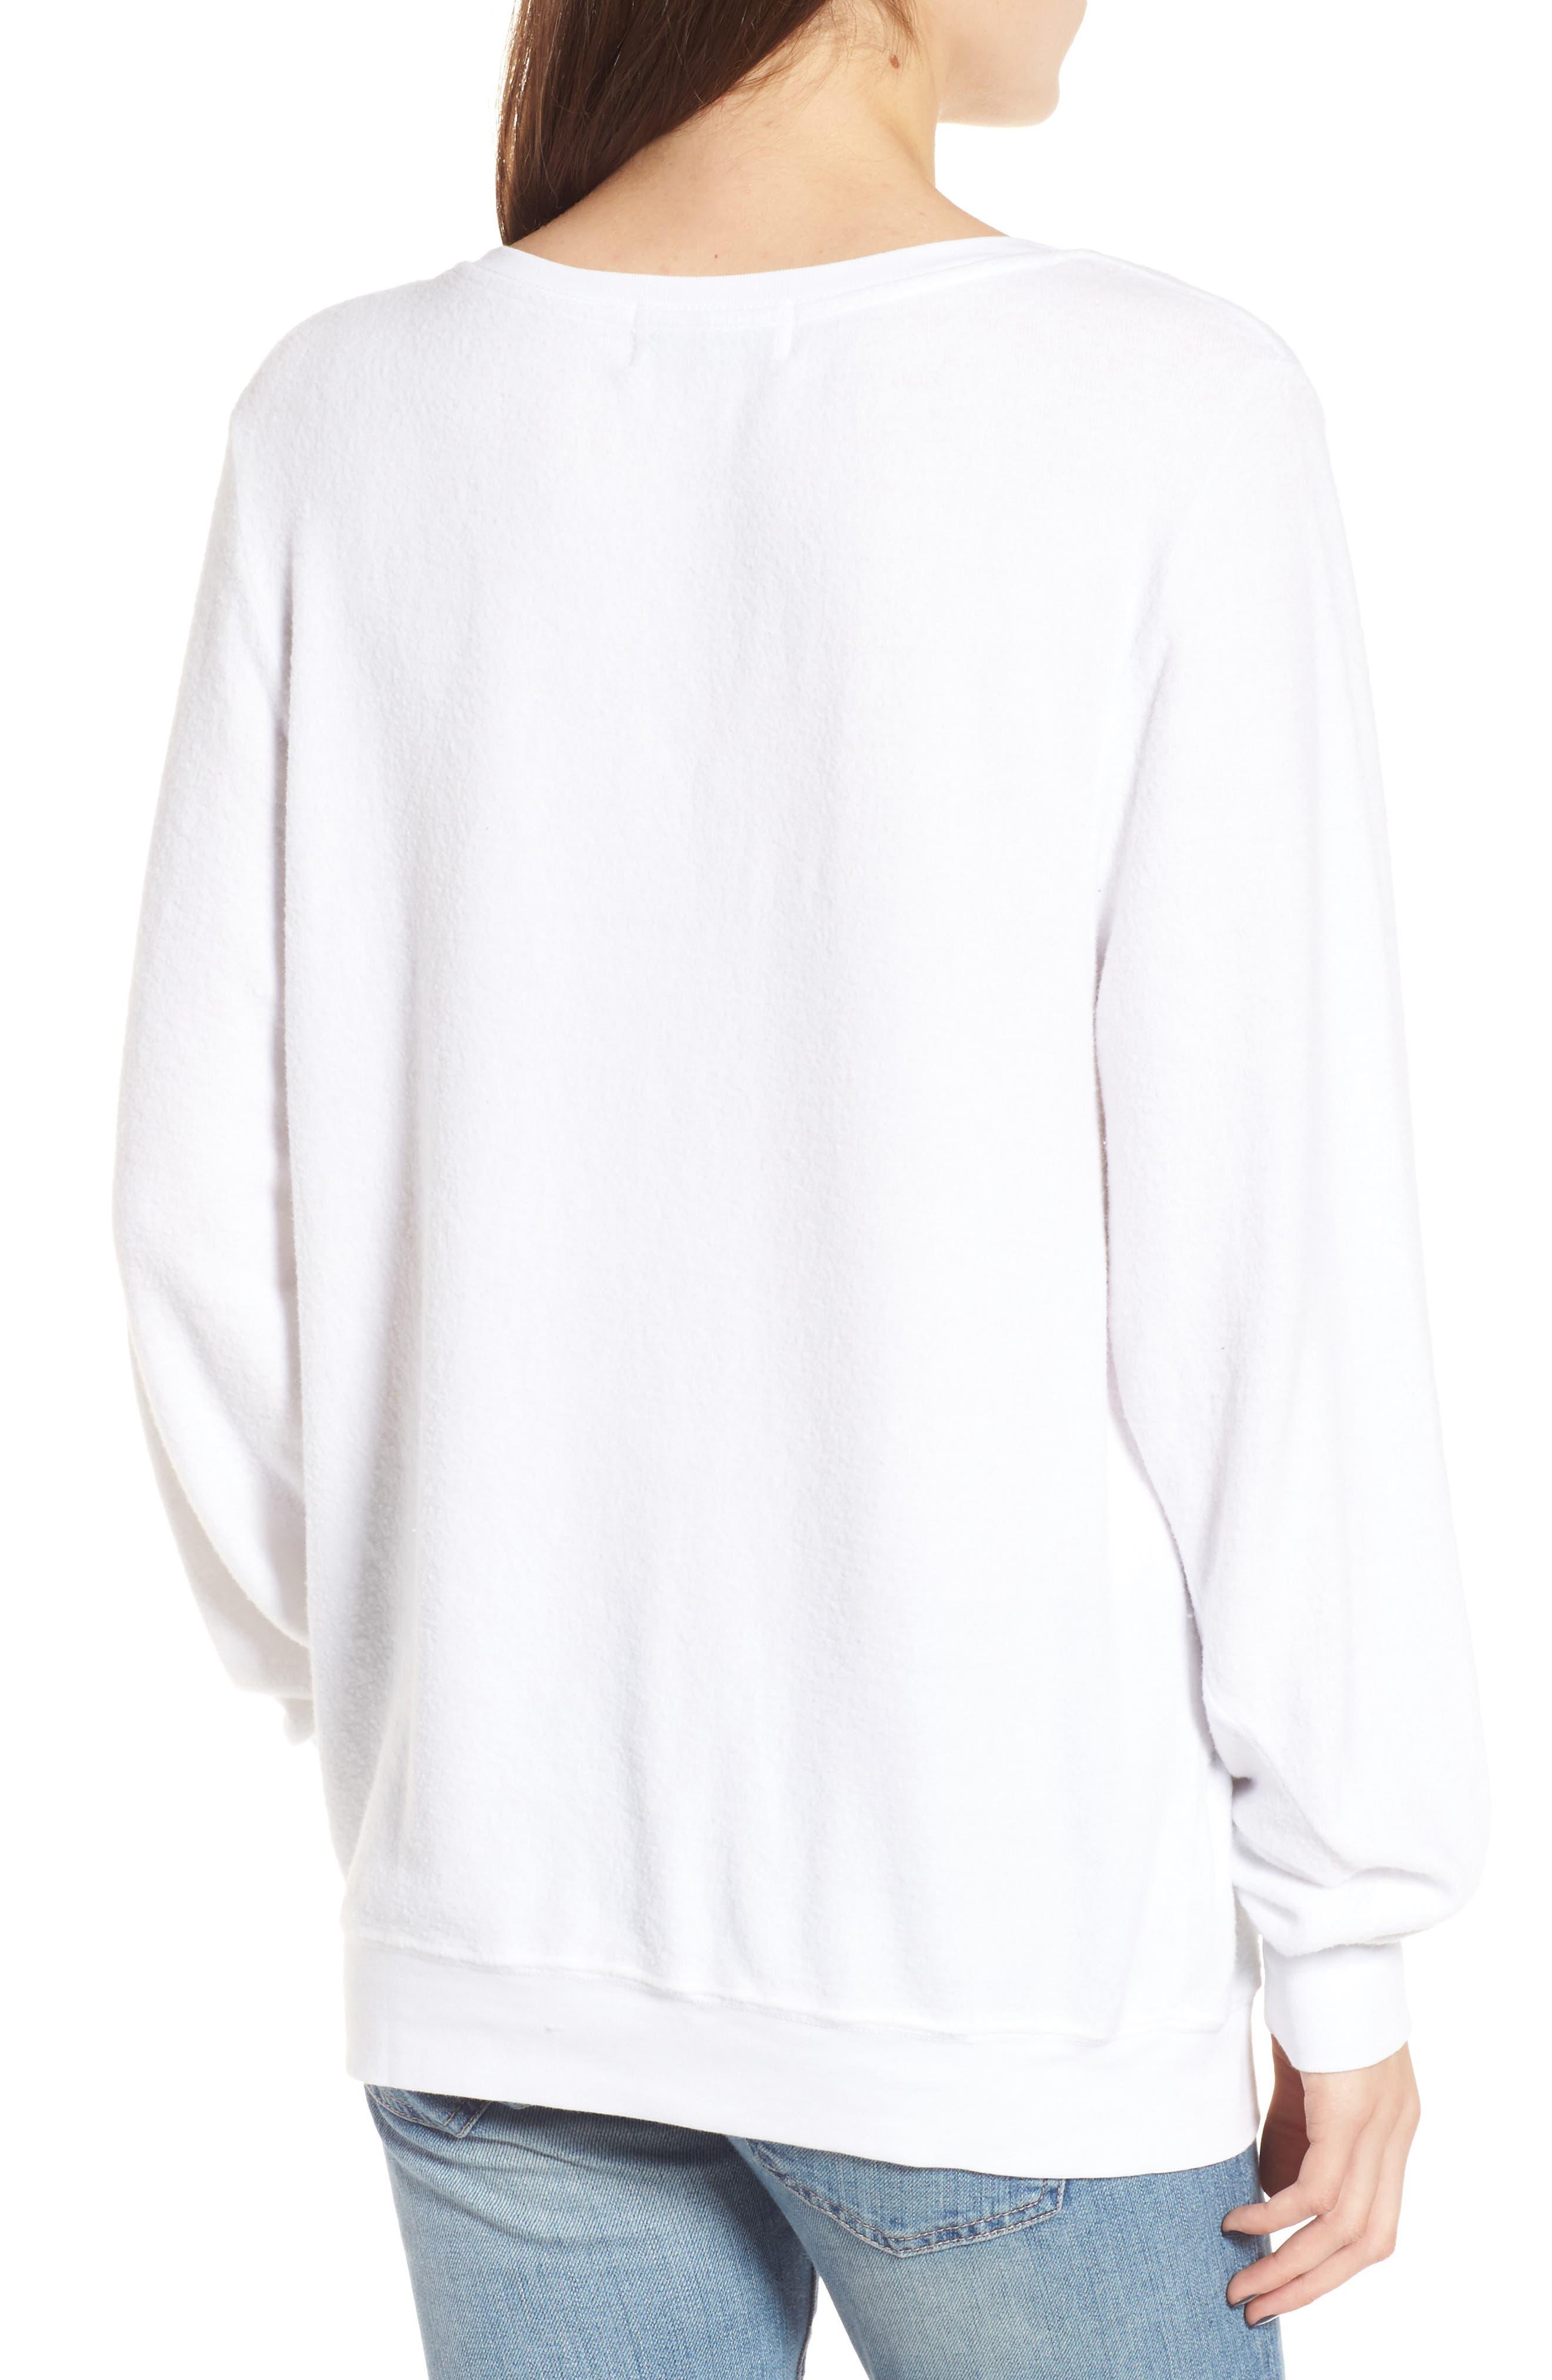 Stay Cool Polar Bear Sweatshirt,                             Alternate thumbnail 2, color,                             Clean White